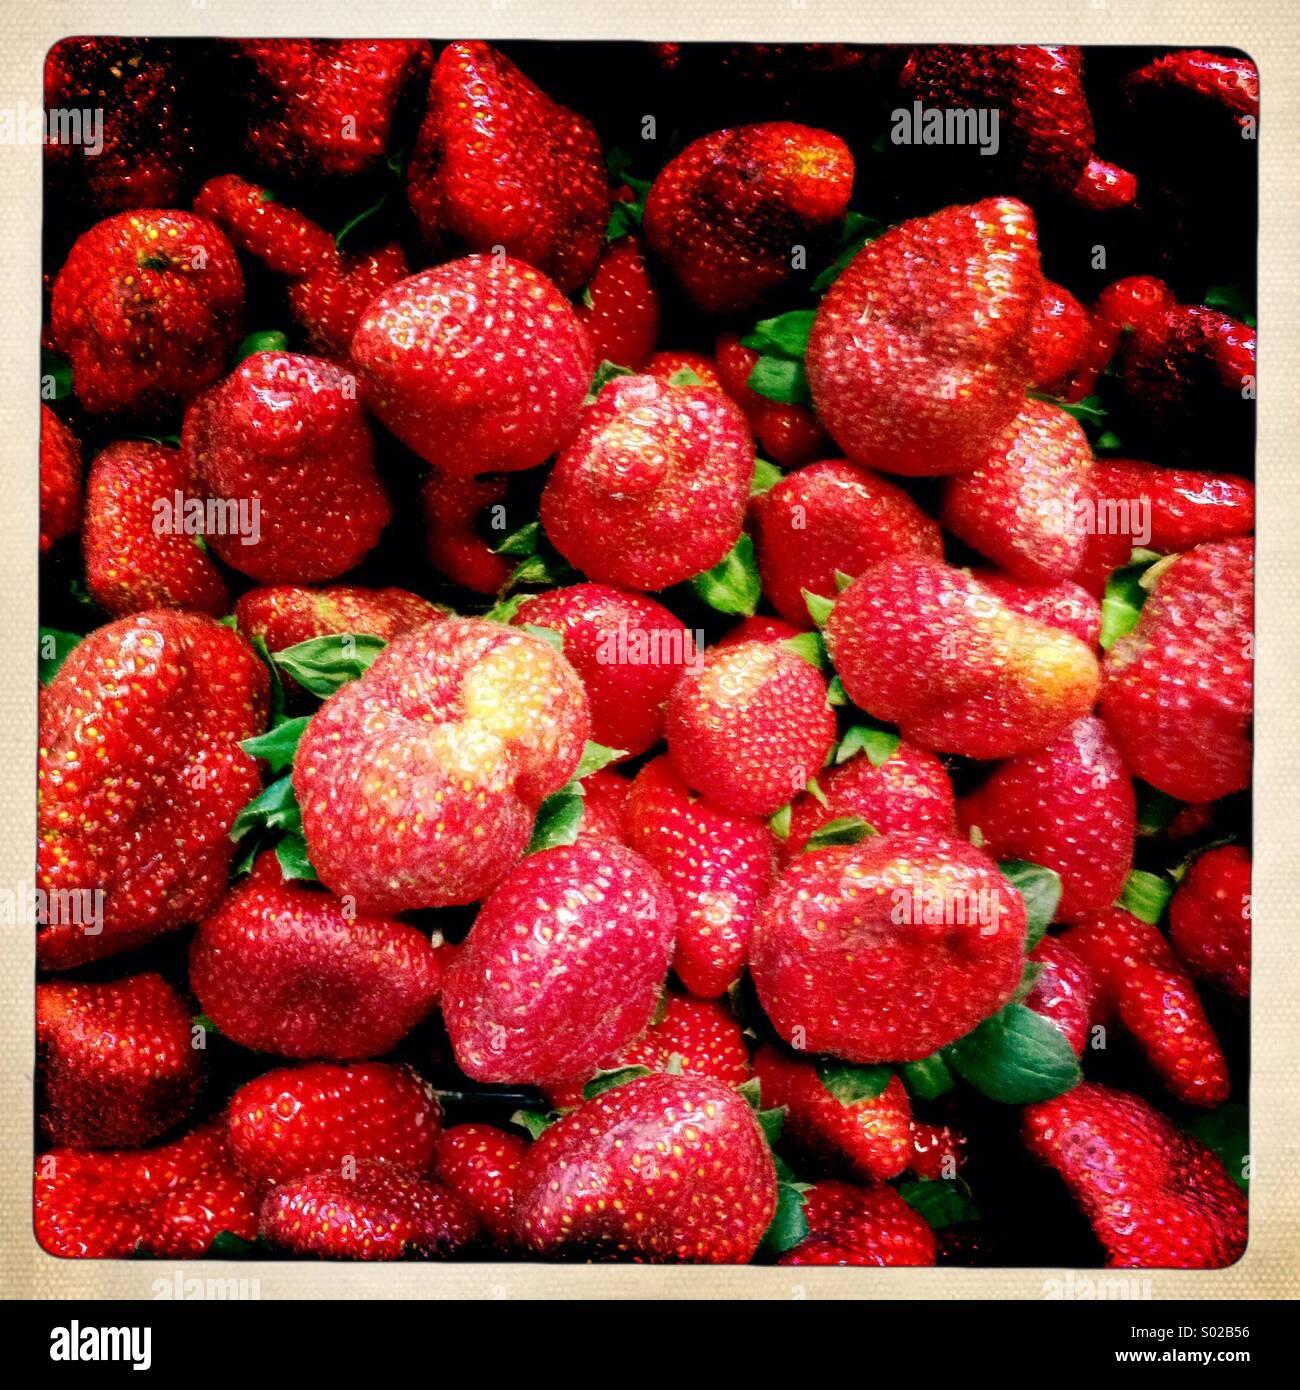 Strawberries in market - Stock Image